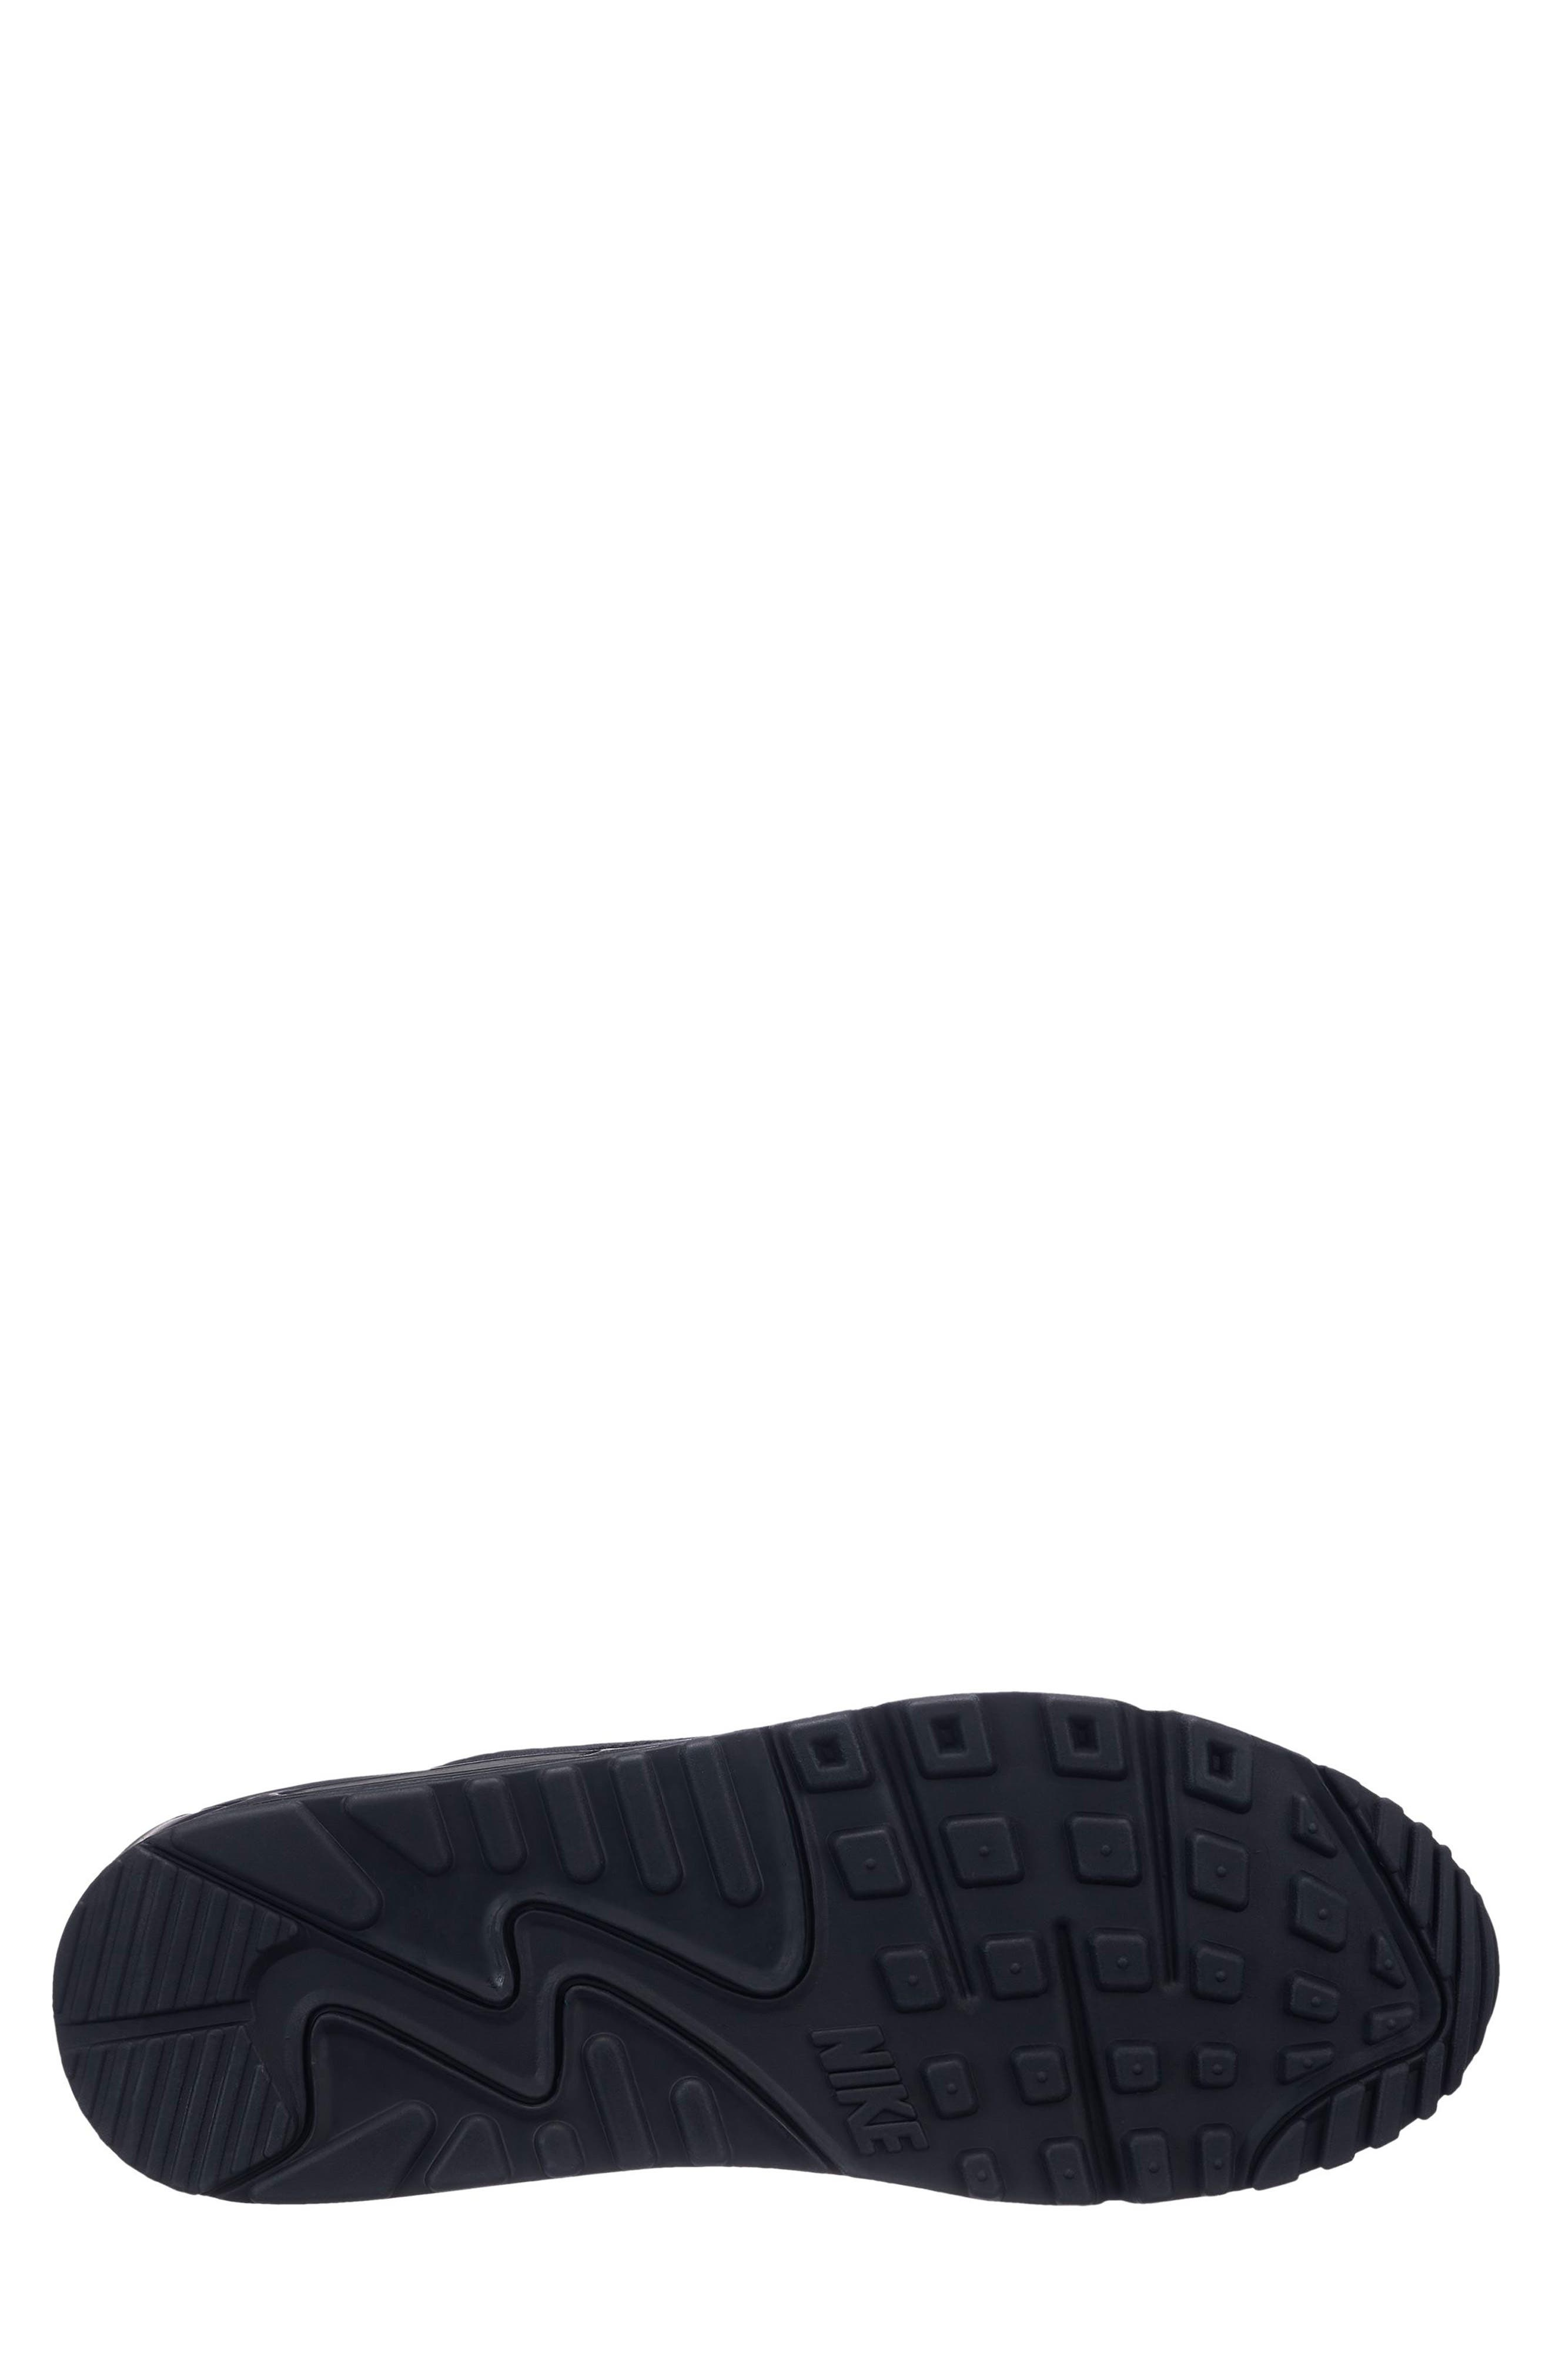 Air Max 90 Essential Sneaker,                             Alternate thumbnail 2, color,                             BLACK/ WHITE